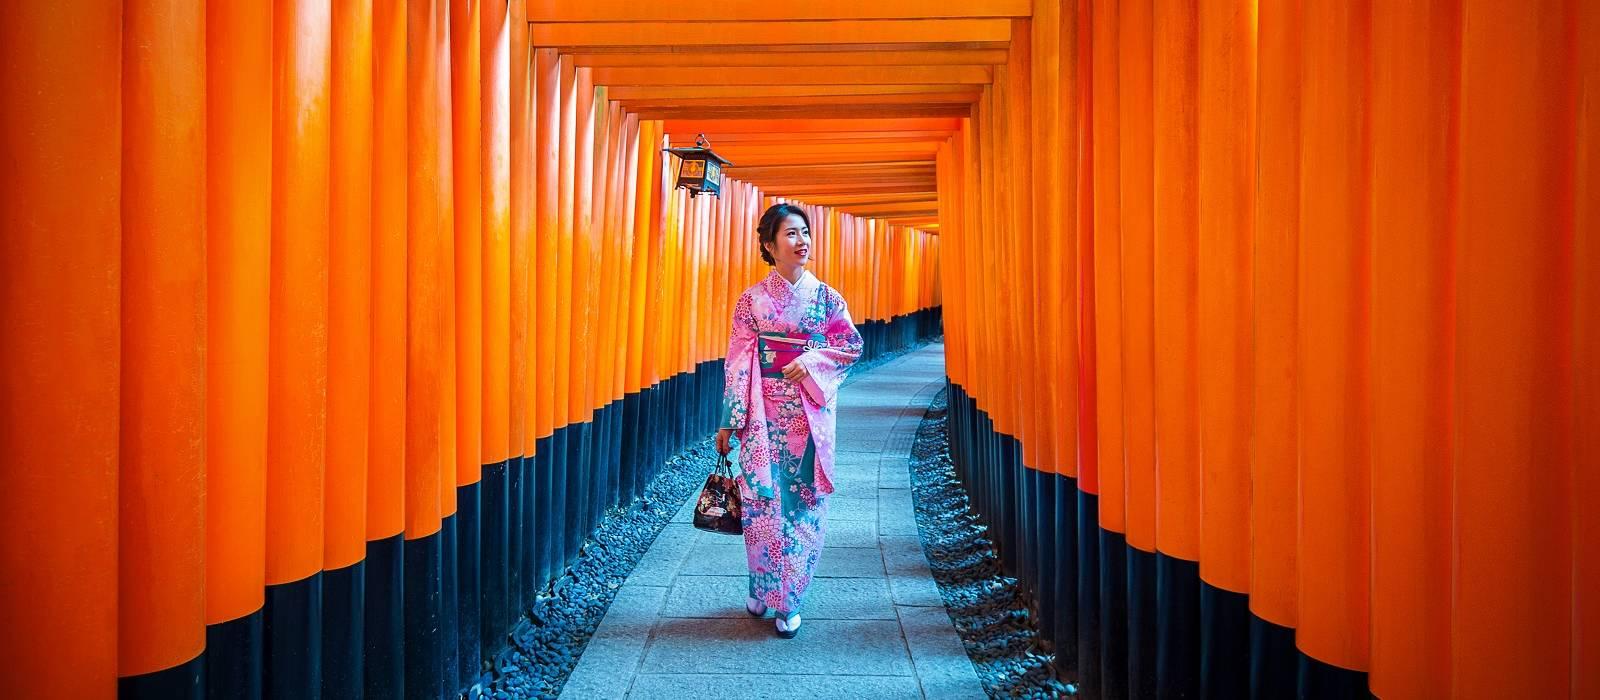 Asian women in traditional japanese kimonos at Fushimi Inari Shrine in Kyoto, Japan - culture of Japan